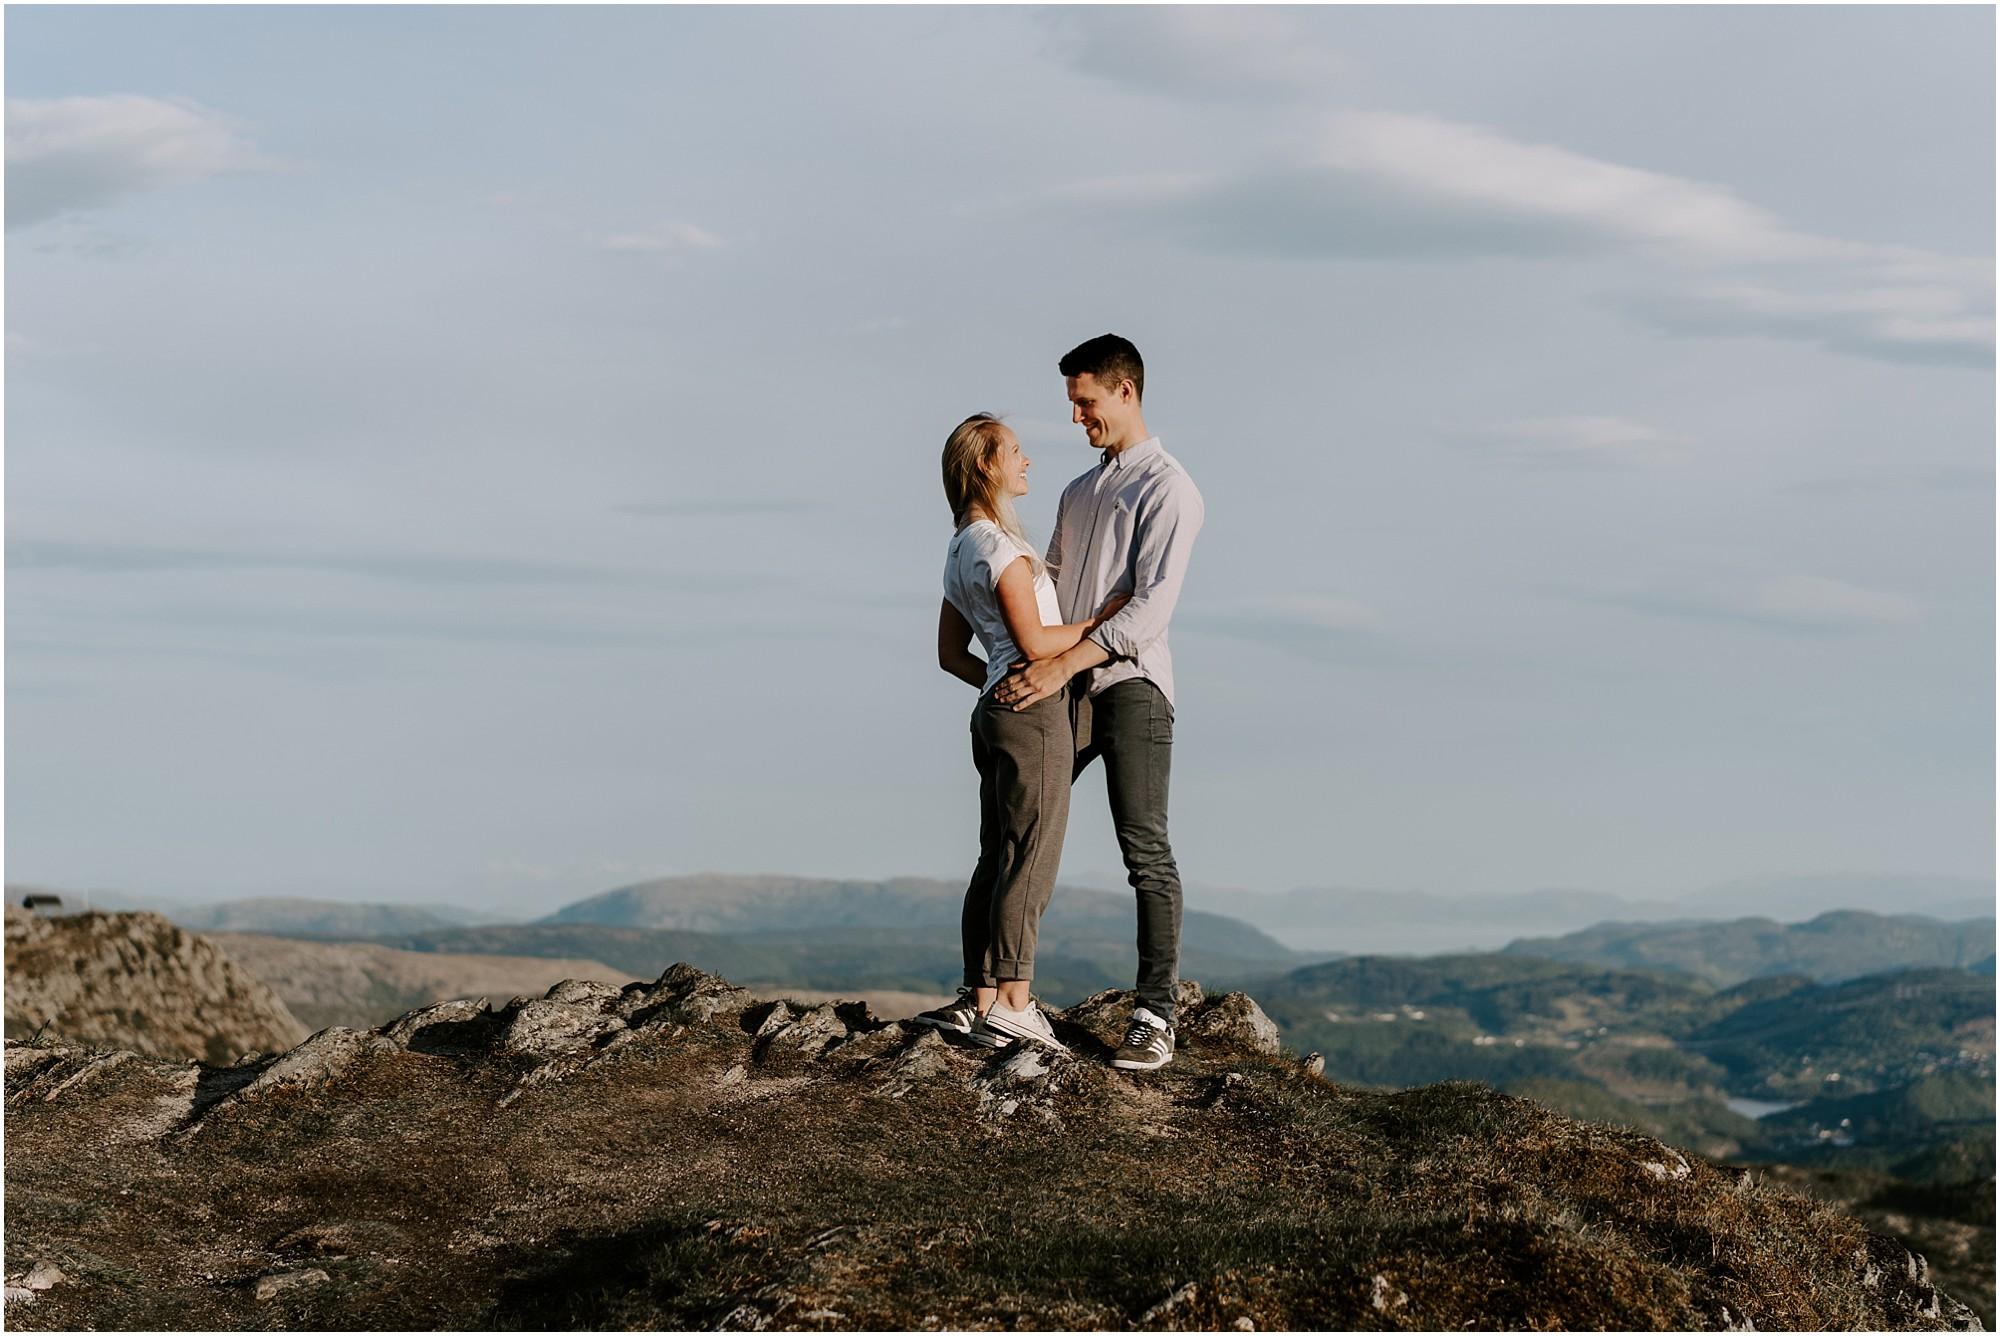 norway-engagement-session-destination-elopement-photographer_0001.jpg